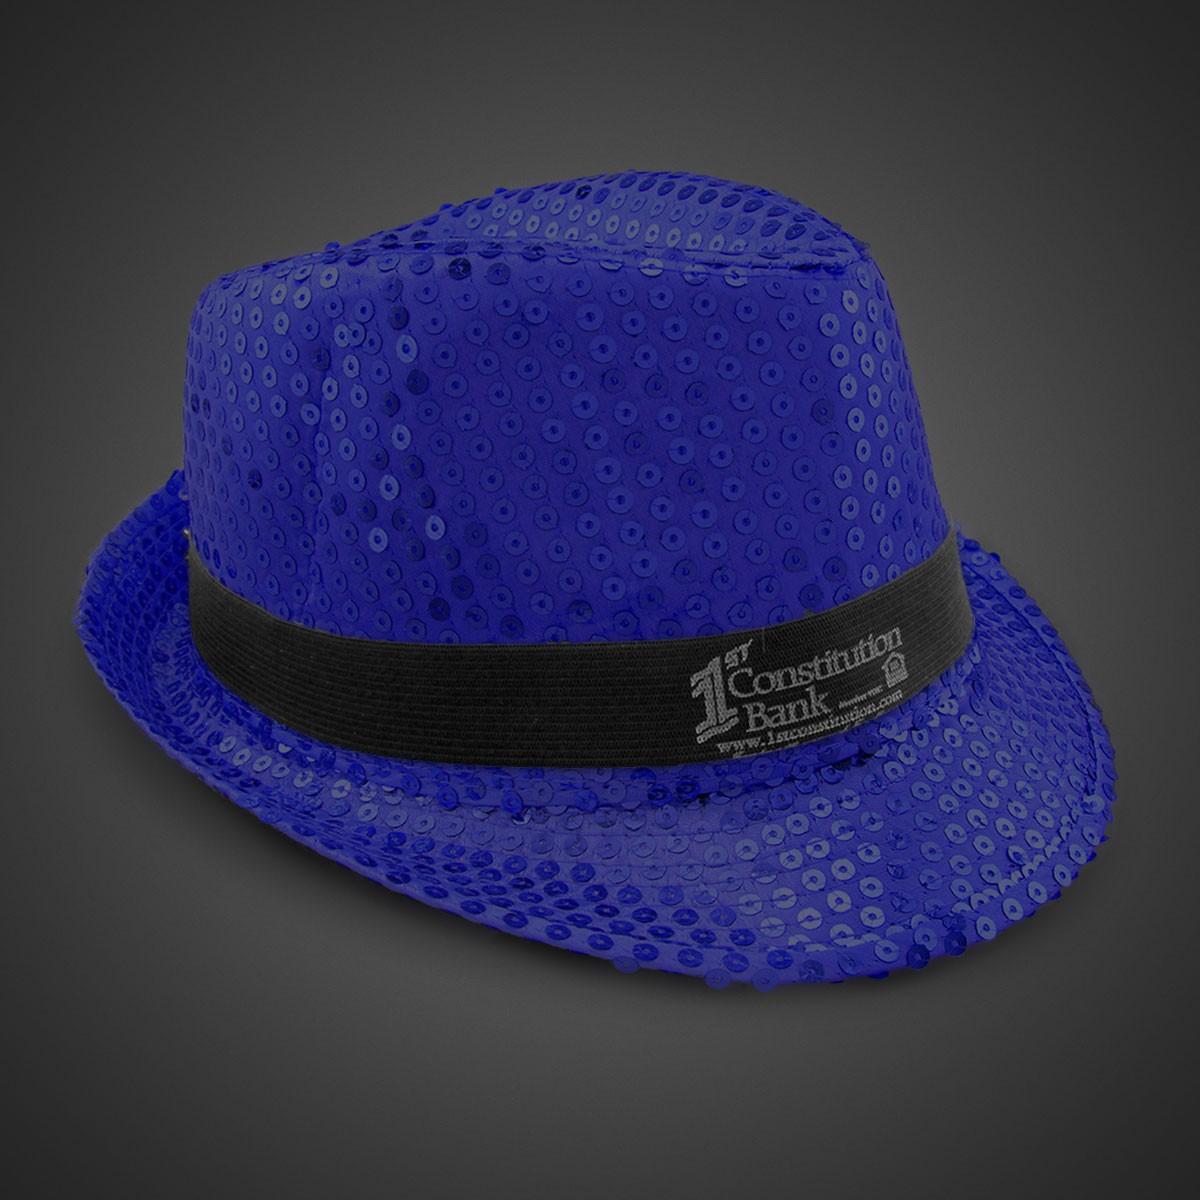 Fedora Dark Grey Borsalino Vintage Men's Hat with Black ...  |Blue Black Band Fedora